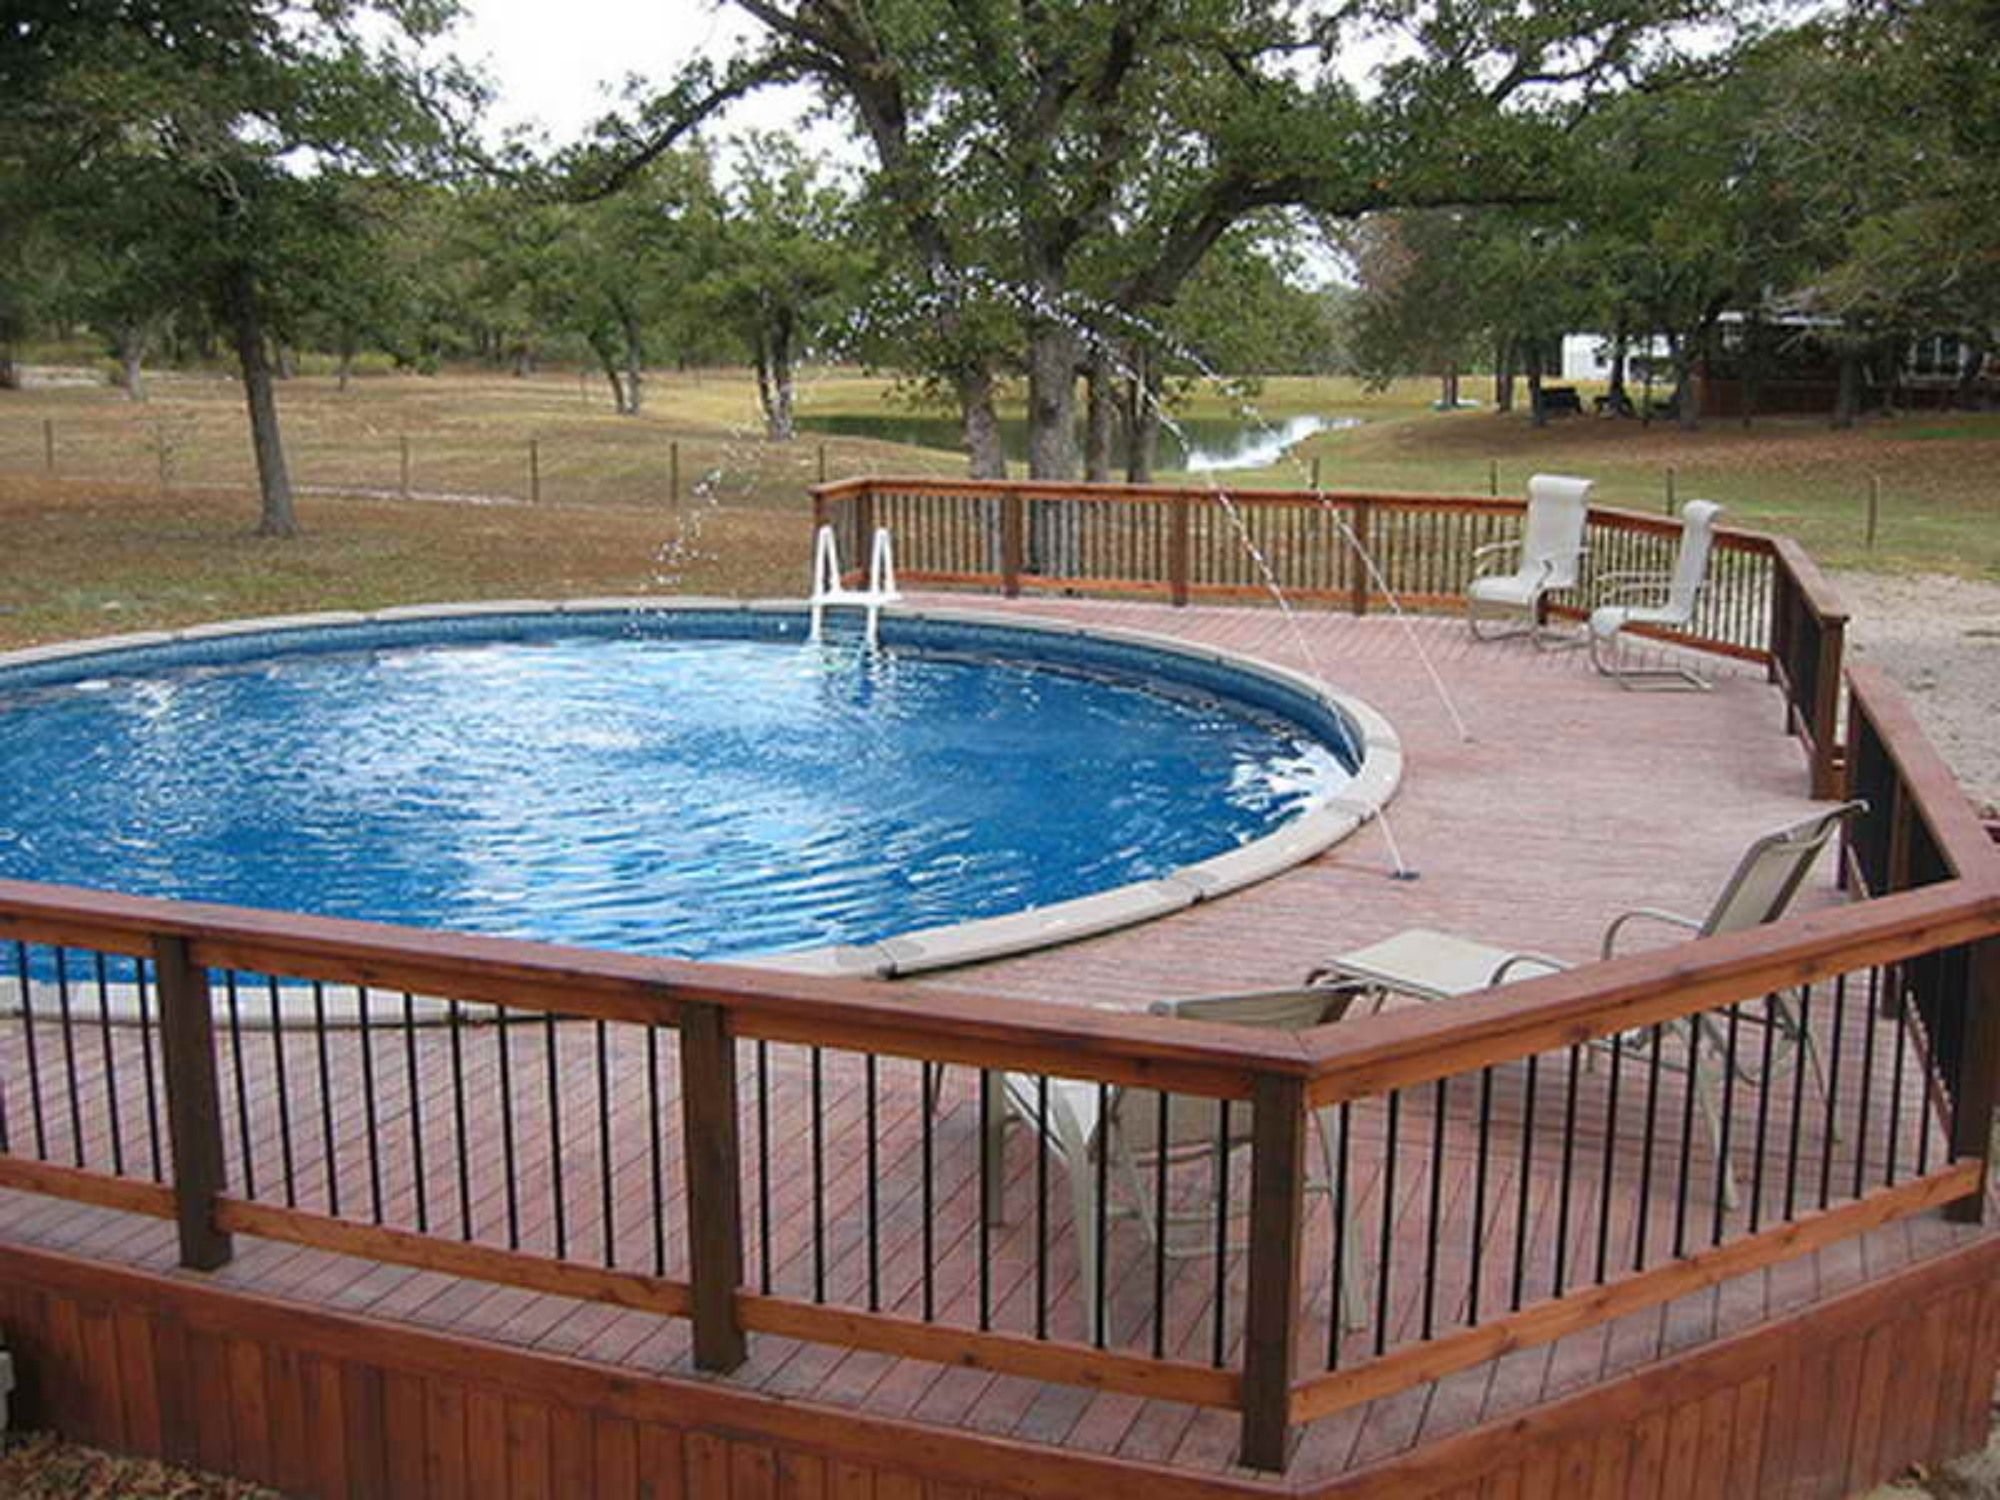 deck plans above ground pool decks above ground pool deck ideas - Above Ground Composite Pool Deck